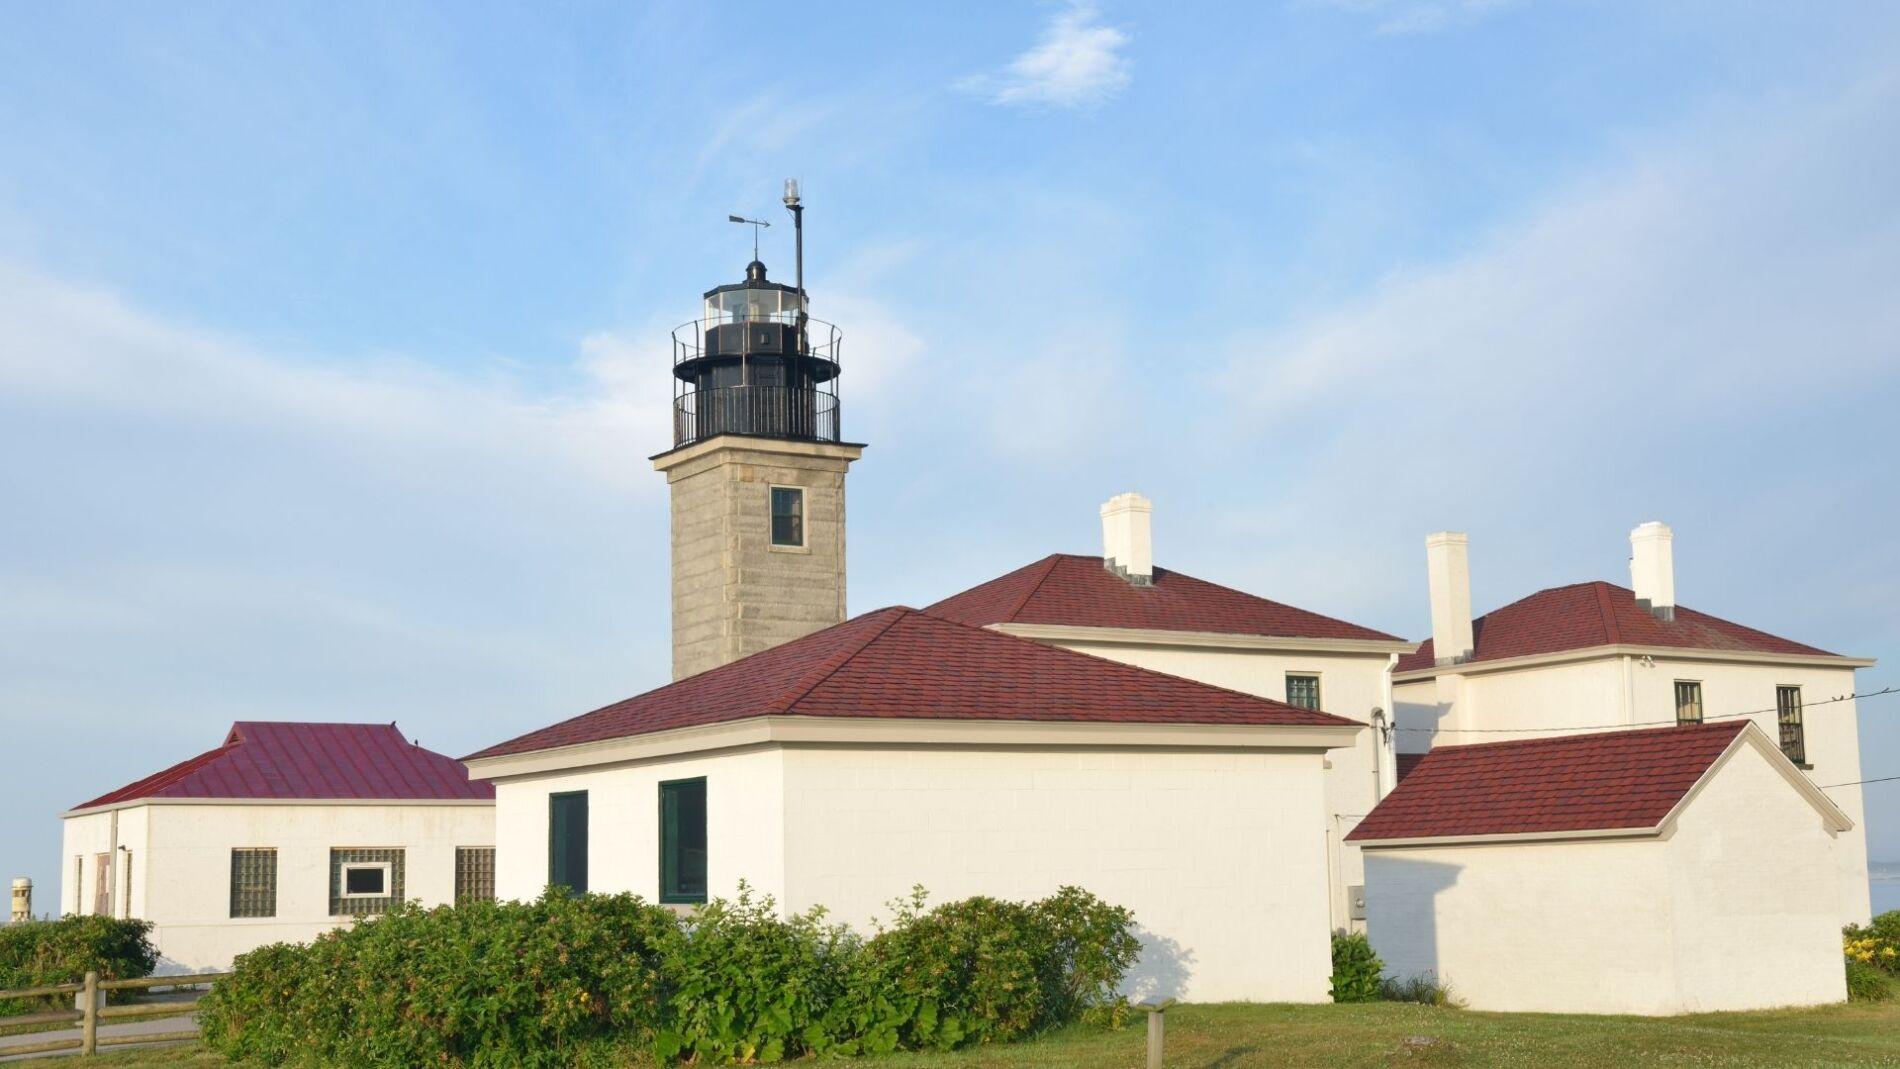 Beavertail lighthouse on the coast near our Narragansett beach house rentals